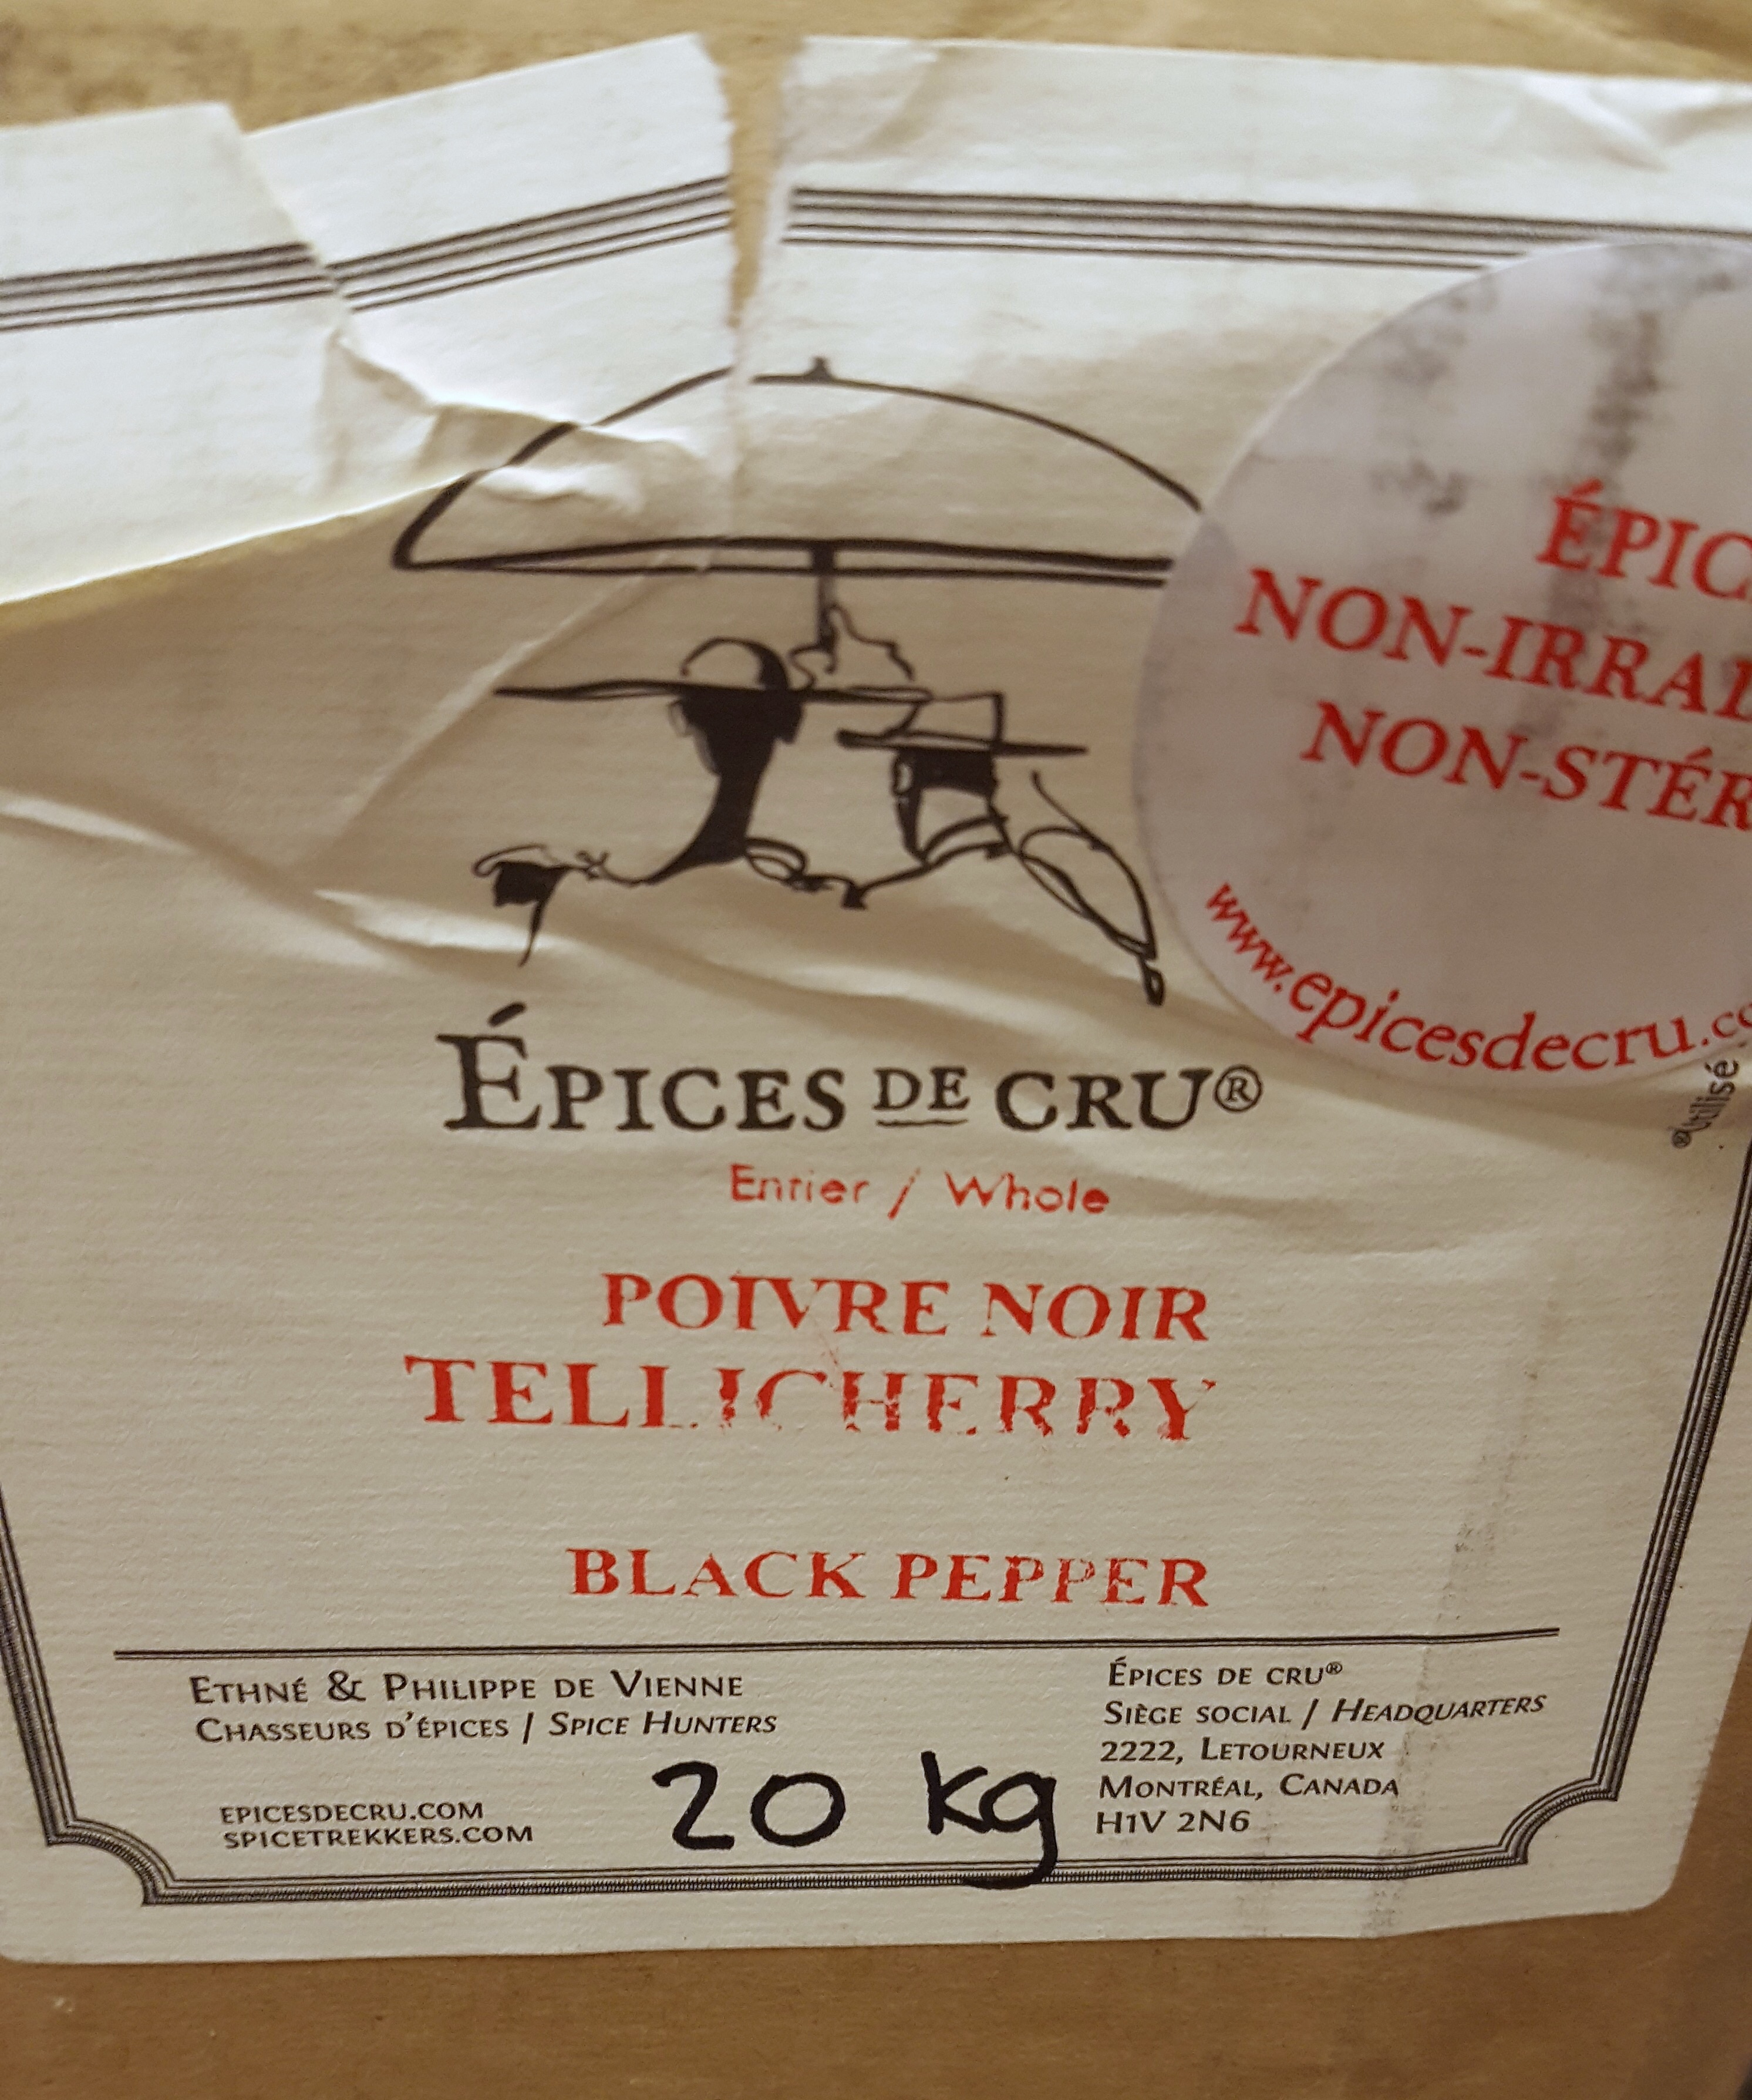 The Big Black Pepper Upgrade